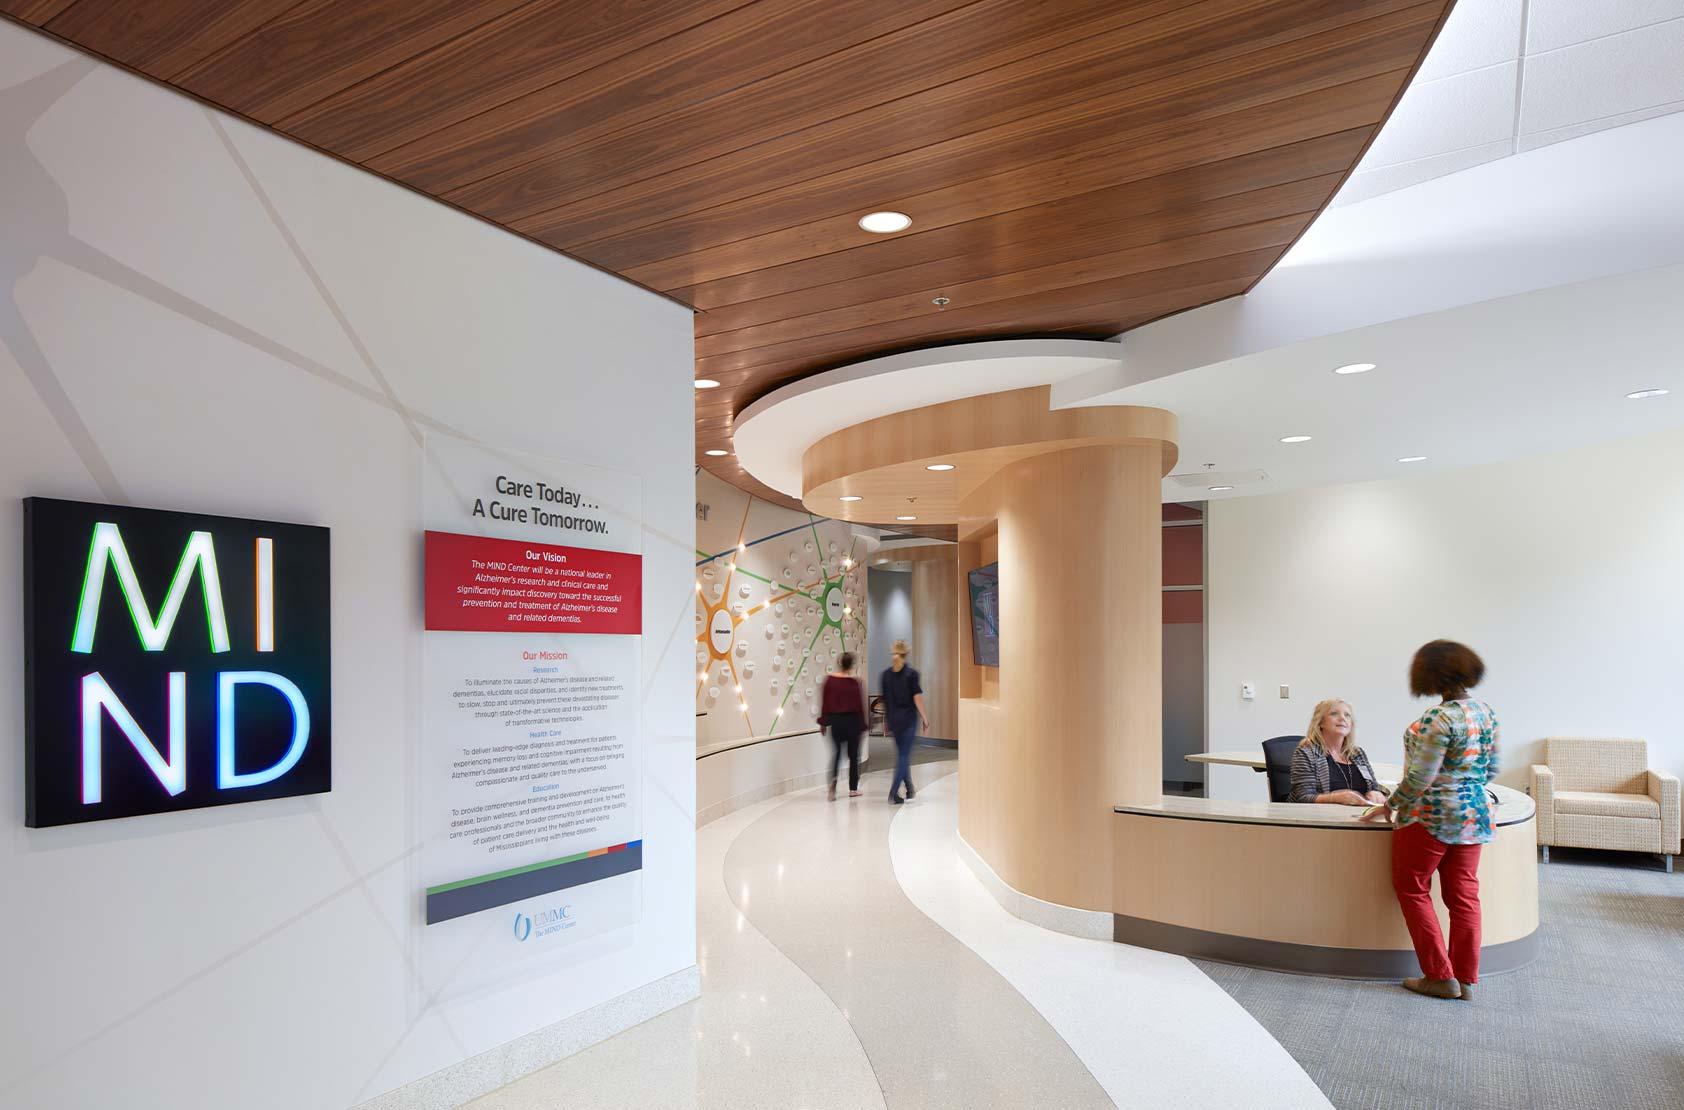 University of Mississippi Medical Center - Translational Research Center